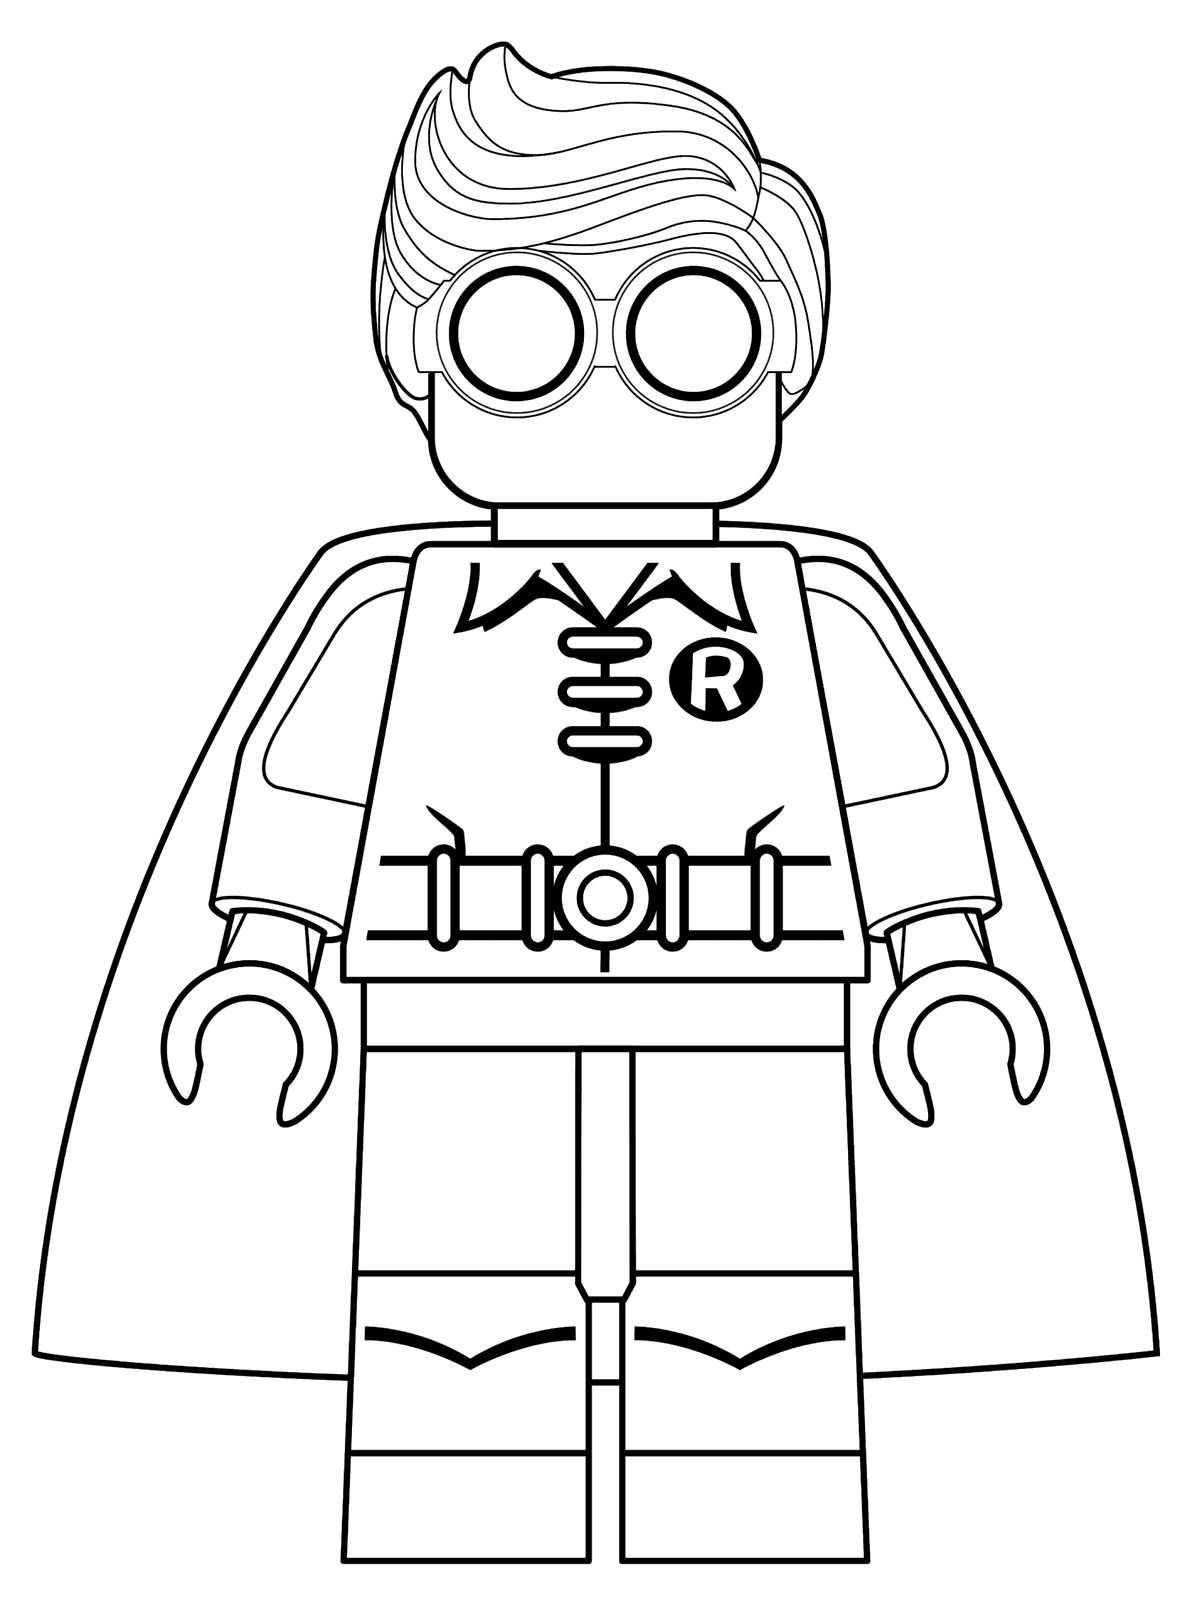 Malvorlage - Lego batman ausmalbilder 3xvbg